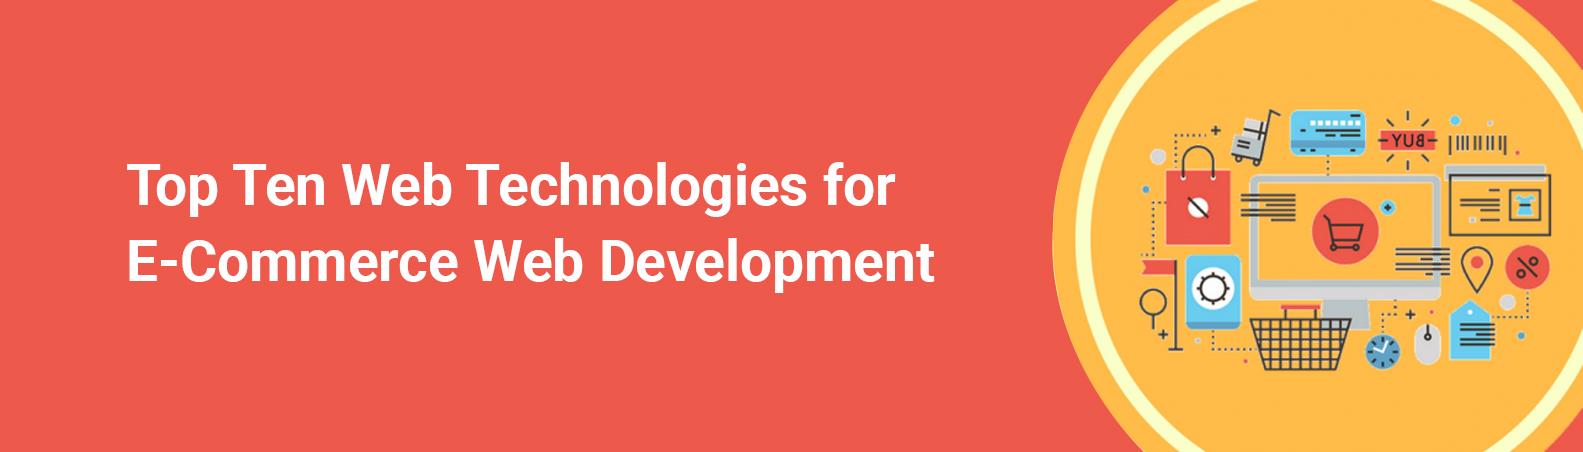 Top Ten Web Technologies for E-Commerce Web Development